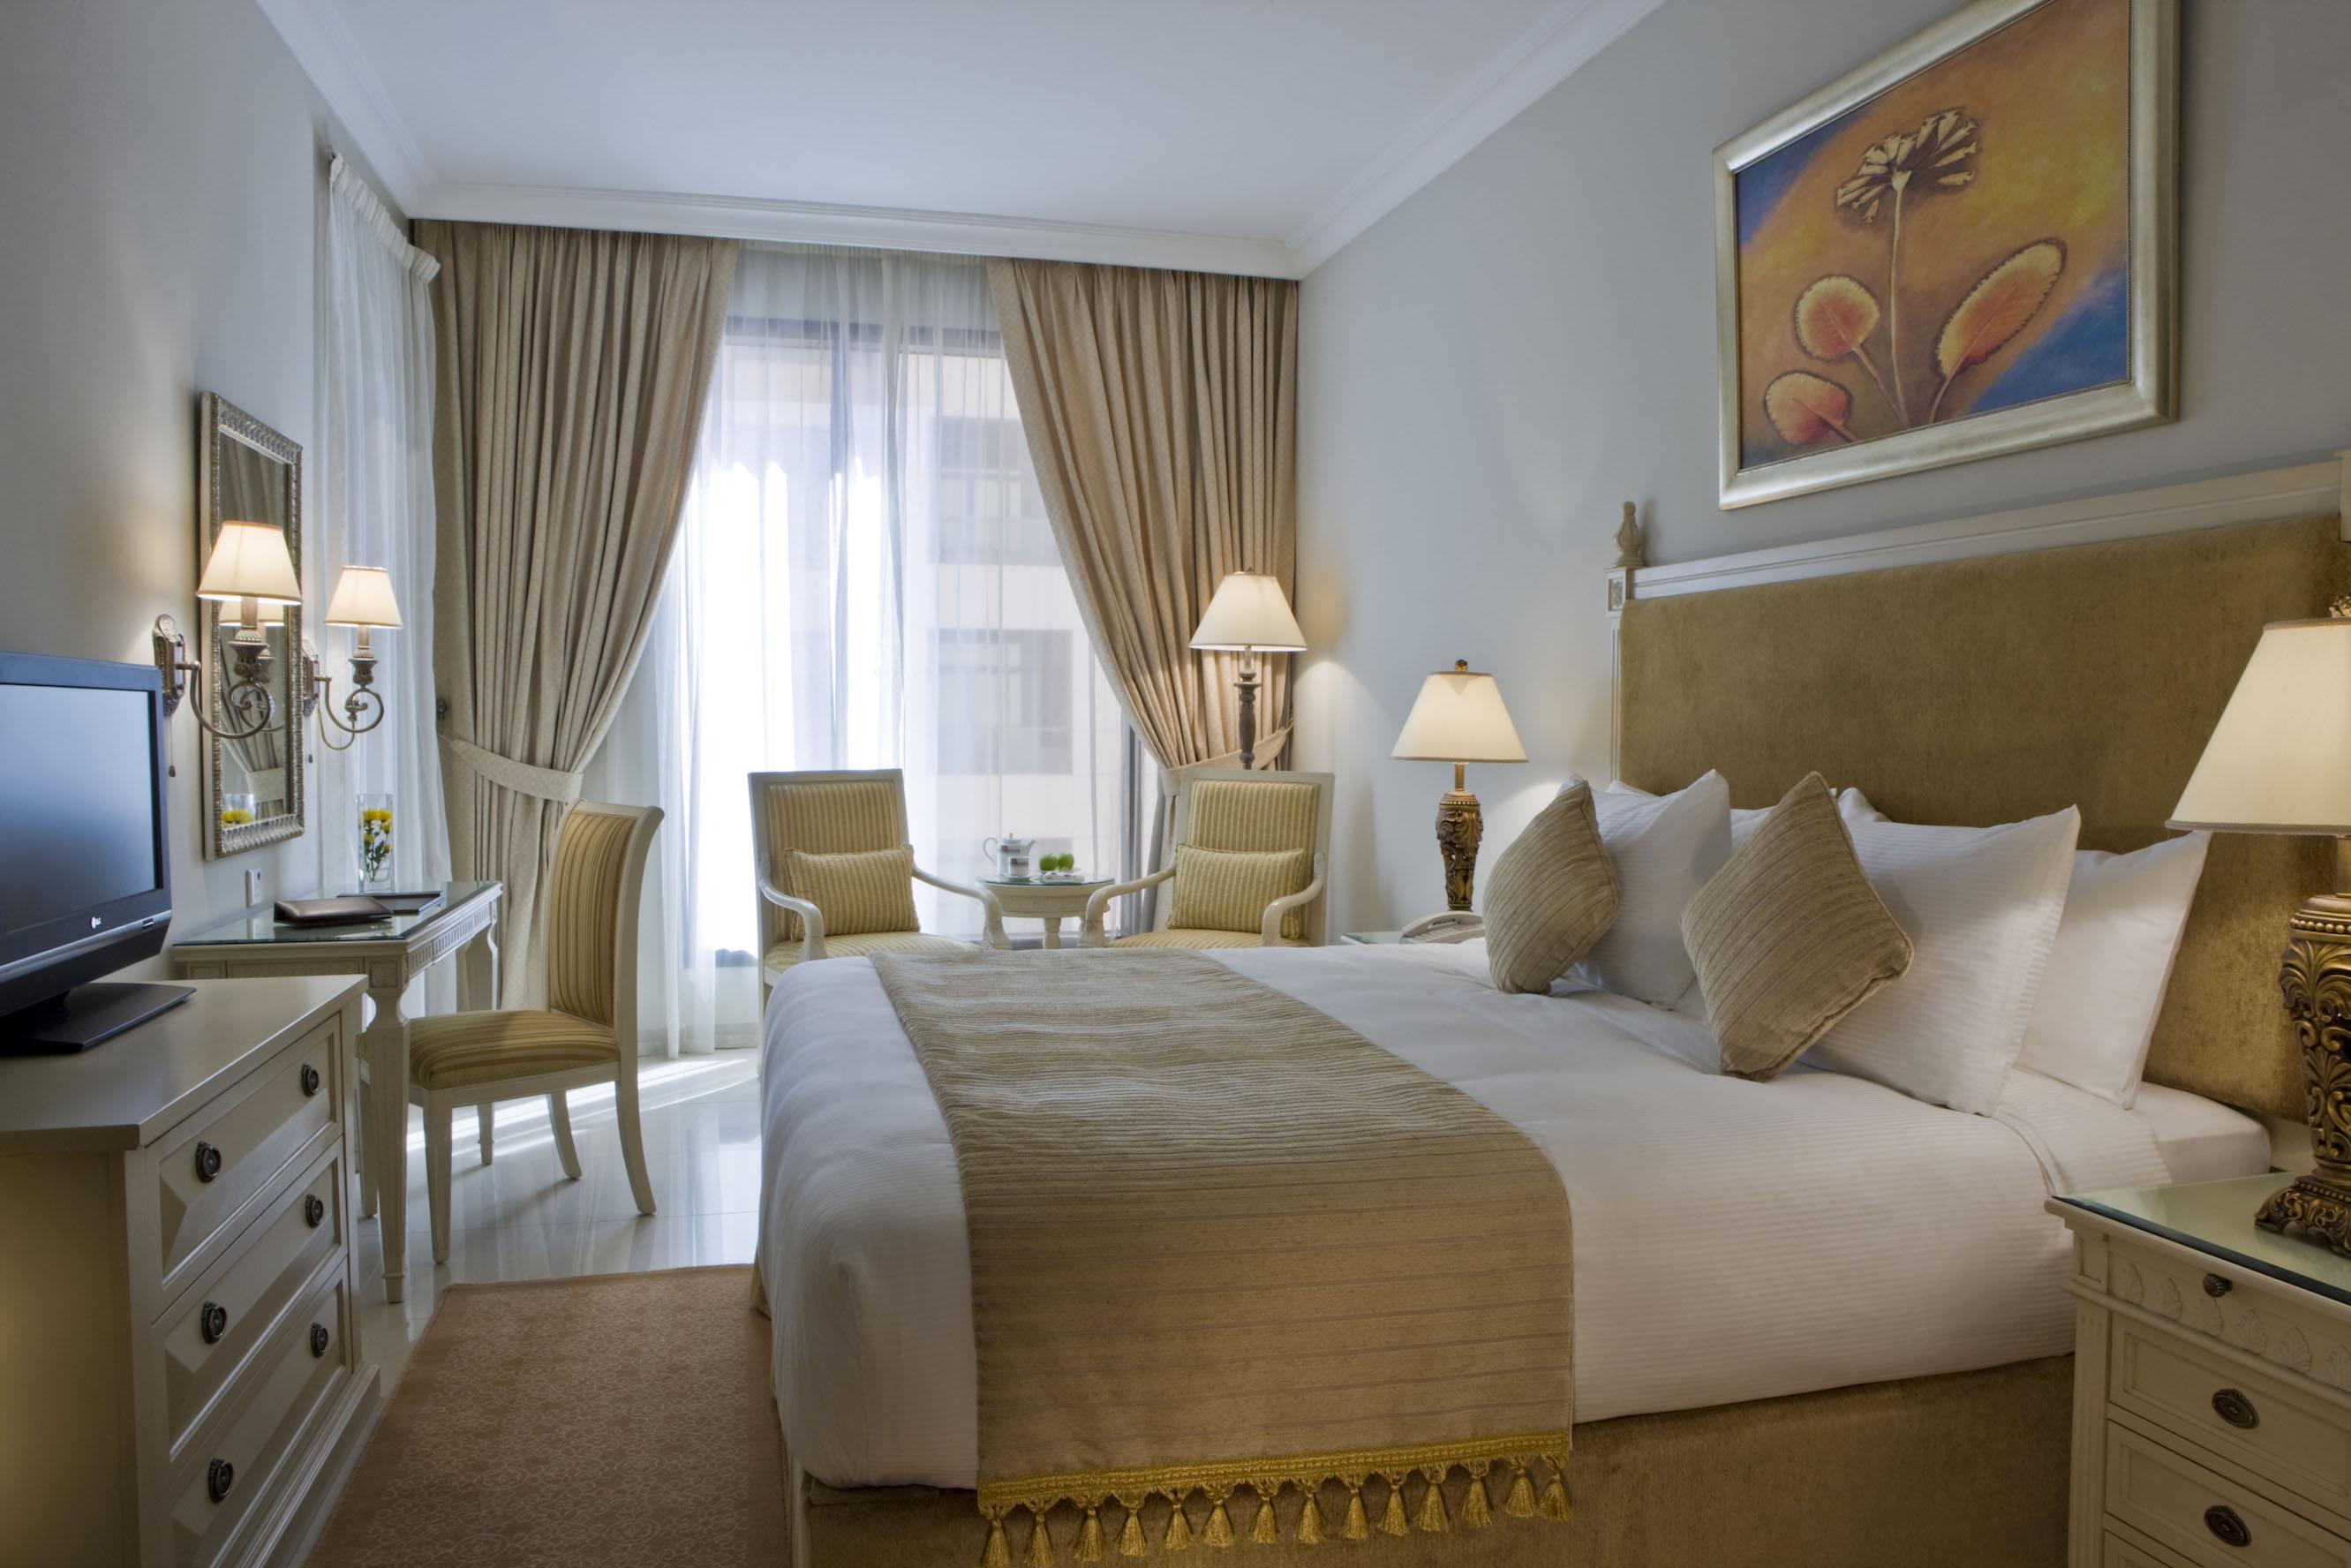 Californian style bedroom02-Rooms-Yassat